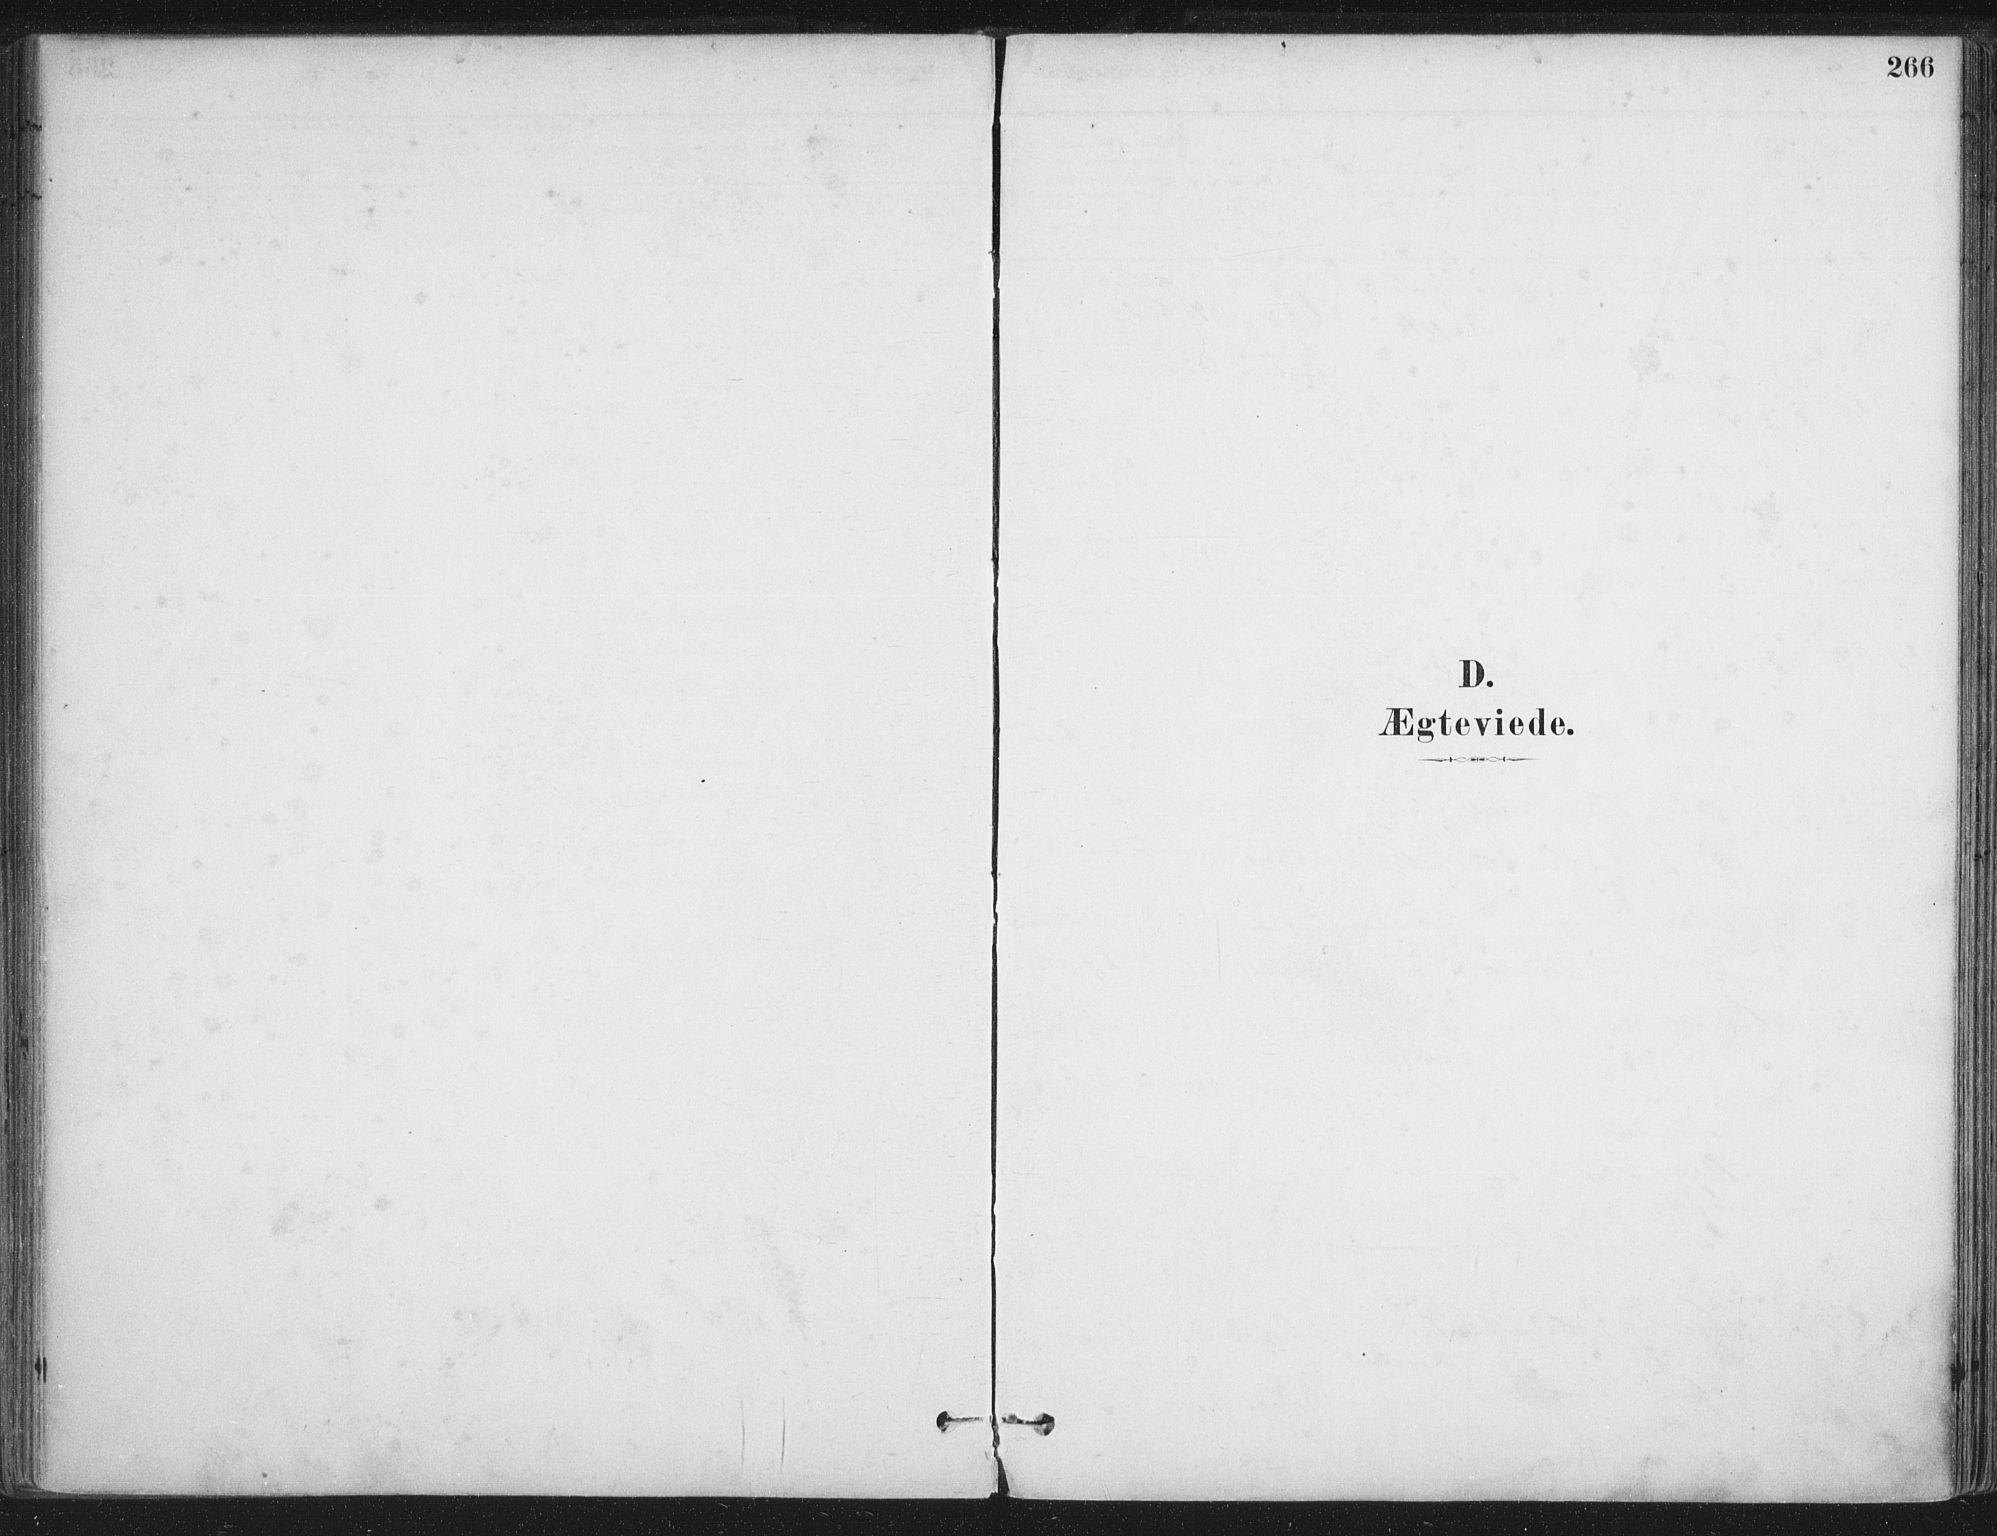 SAT, Ministerialprotokoller, klokkerbøker og fødselsregistre - Nordland, 888/L1244: Ministerialbok nr. 888A10, 1880-1890, s. 266